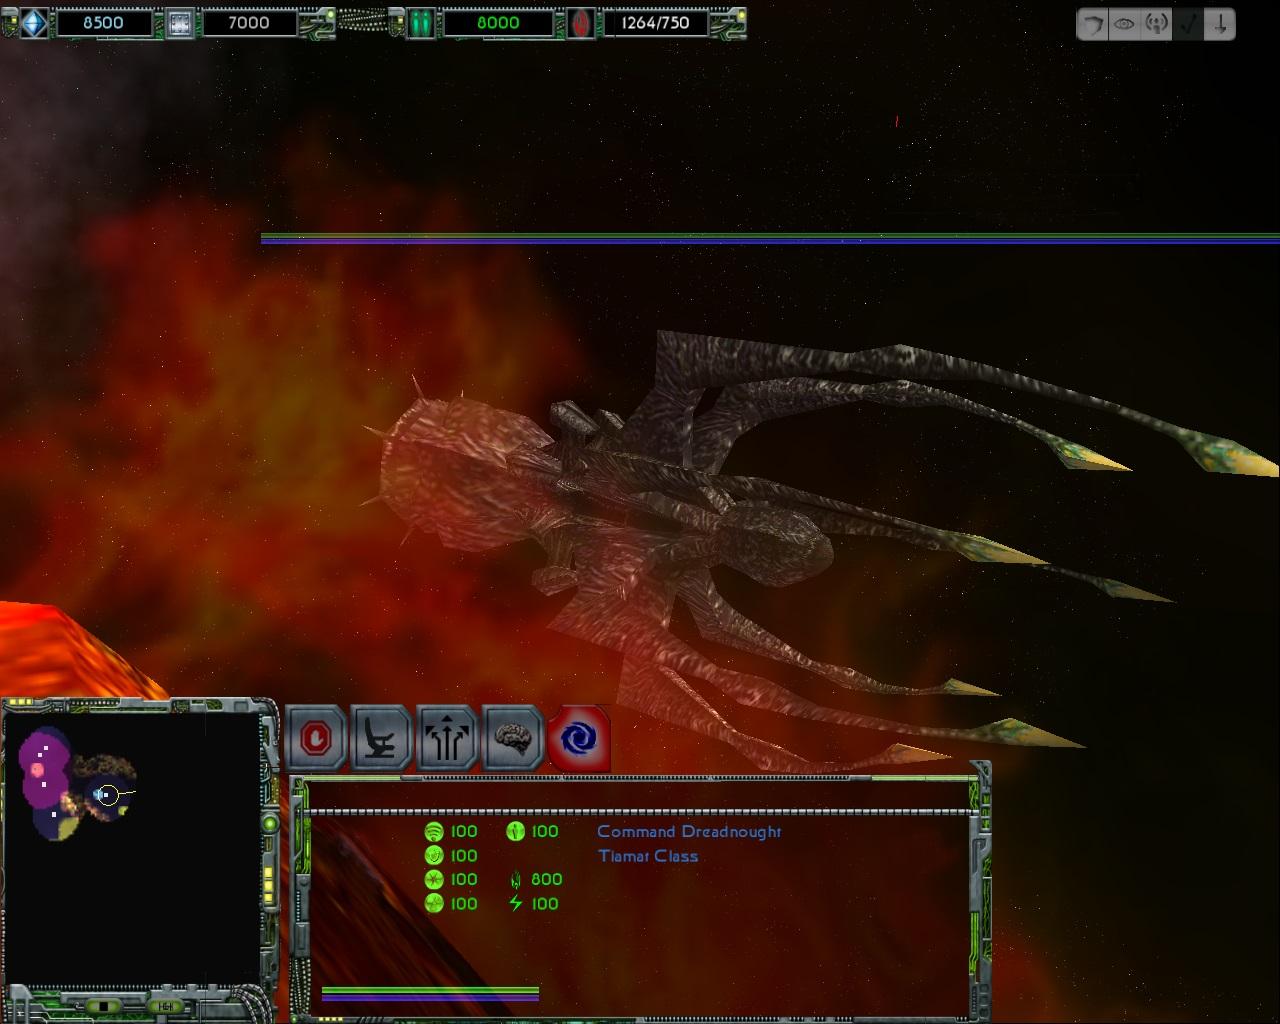 nephilim added to star trek armada 2 mod wing commander cic